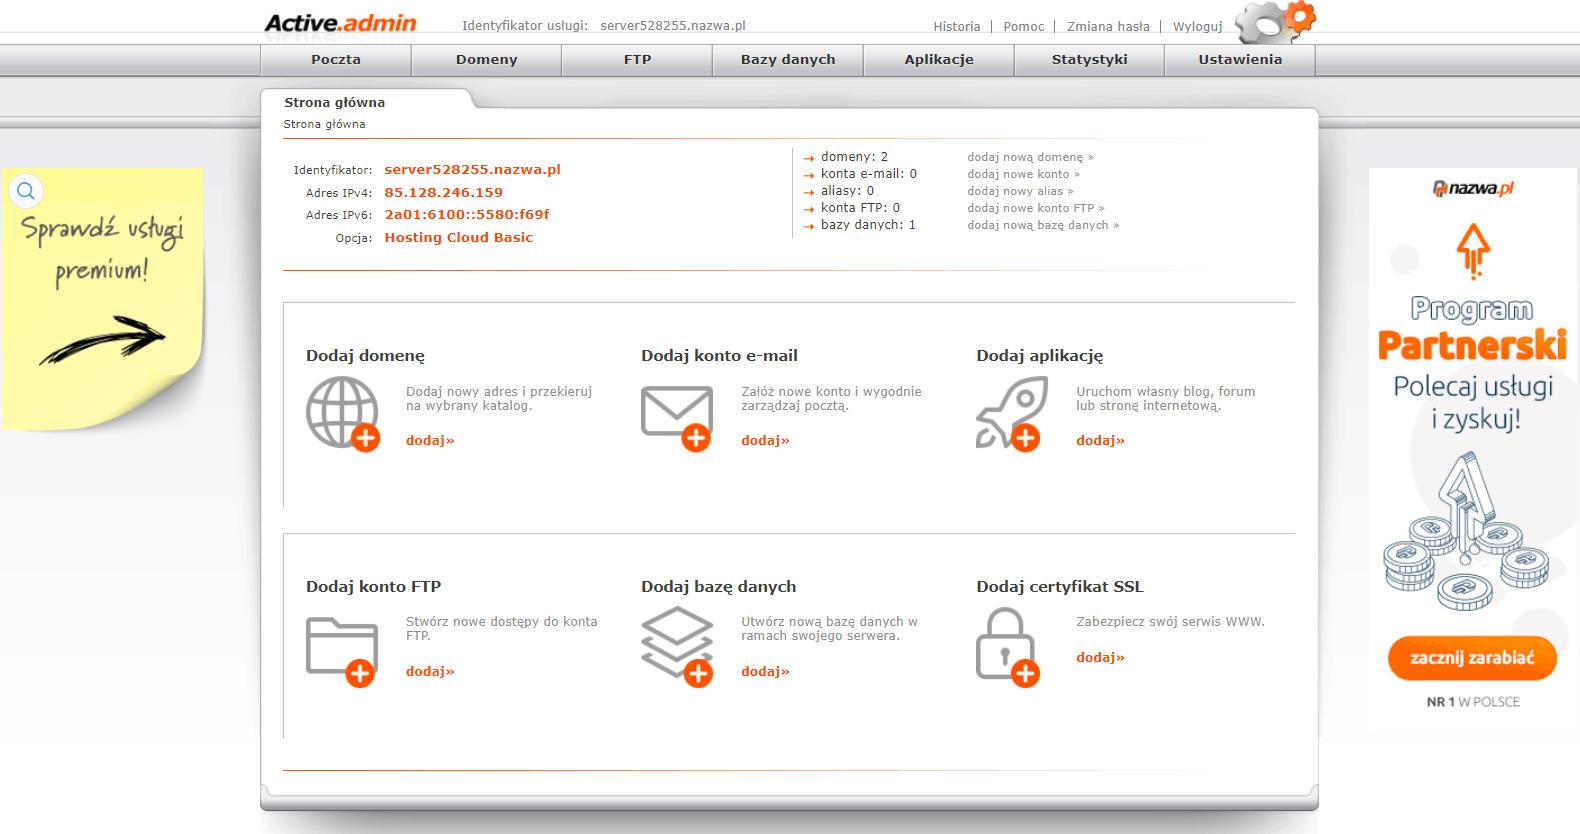 panel klienta nazwa.pl